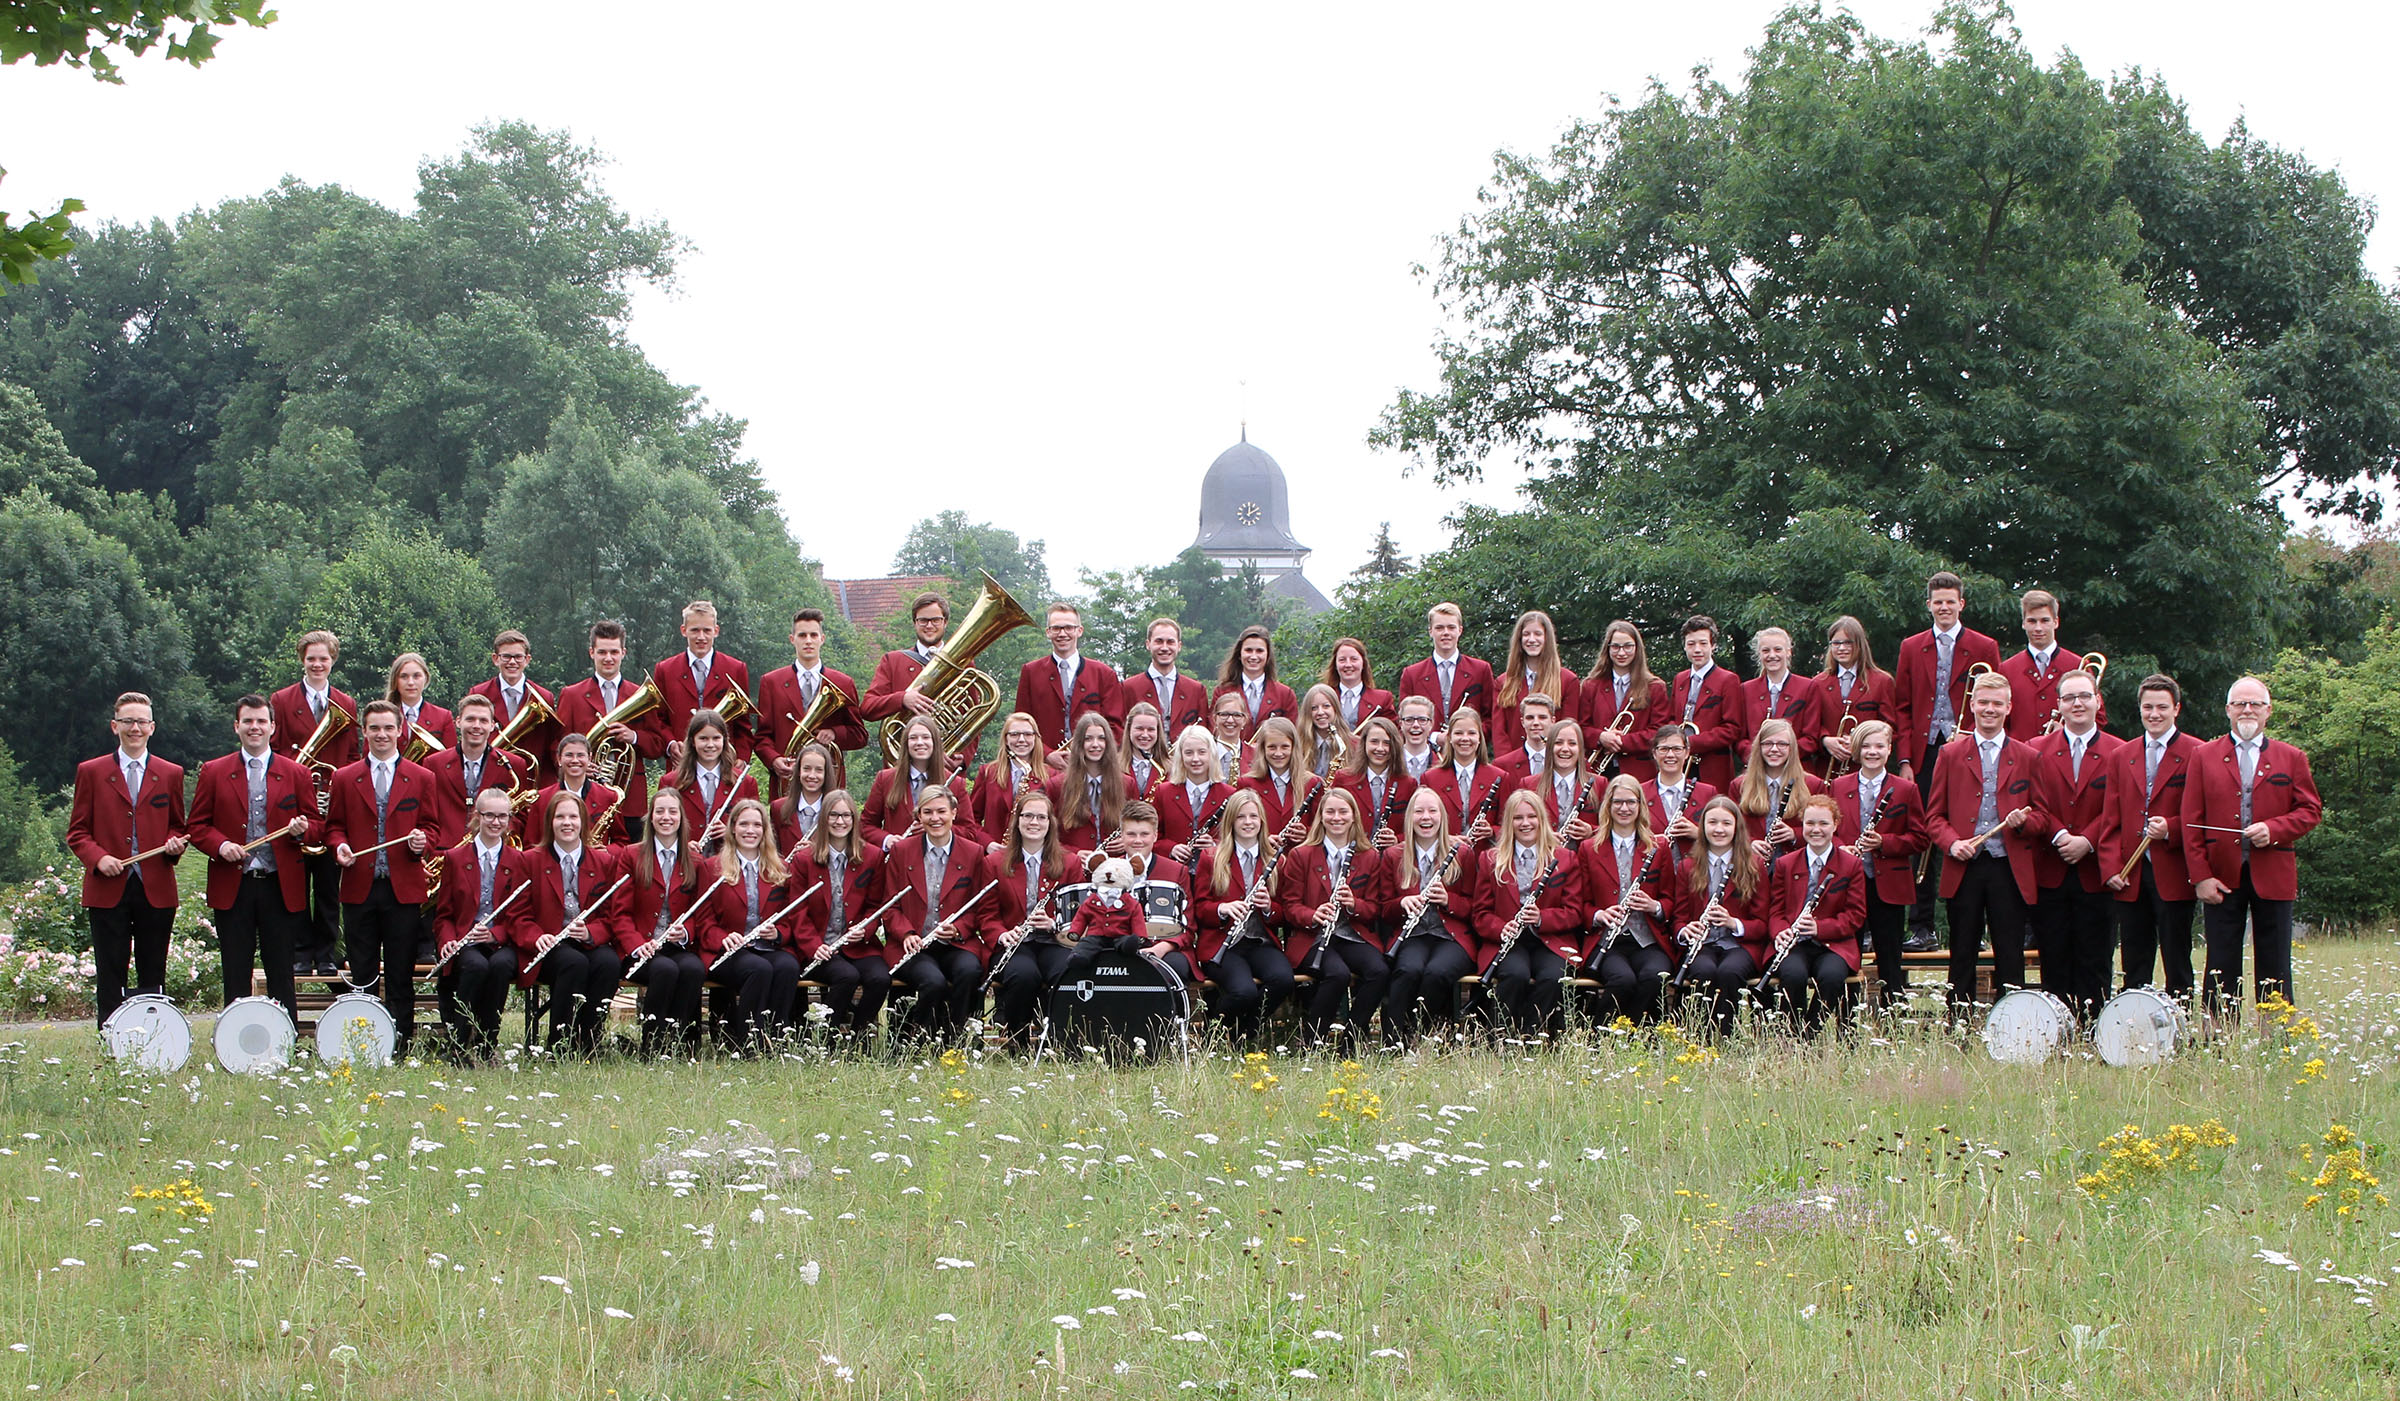 Jugendorchester des Musikverein Verl